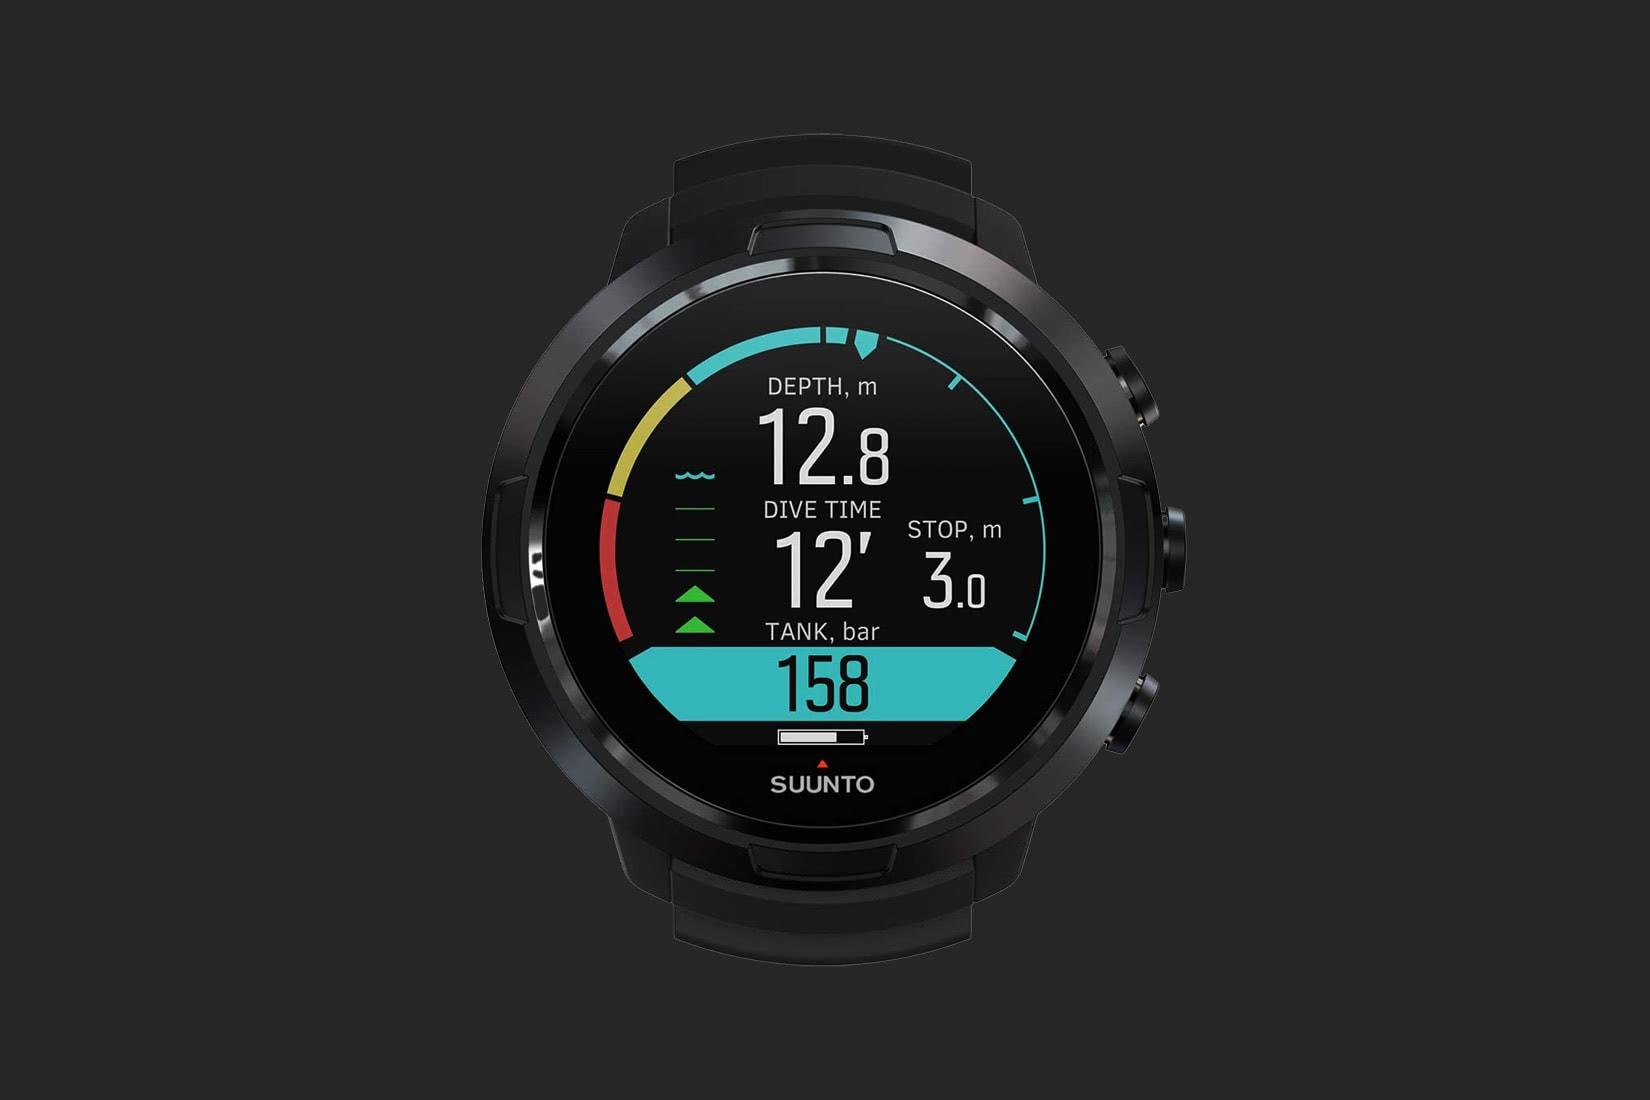 best diving wrist computer suunto D5 review - Luxe Digital